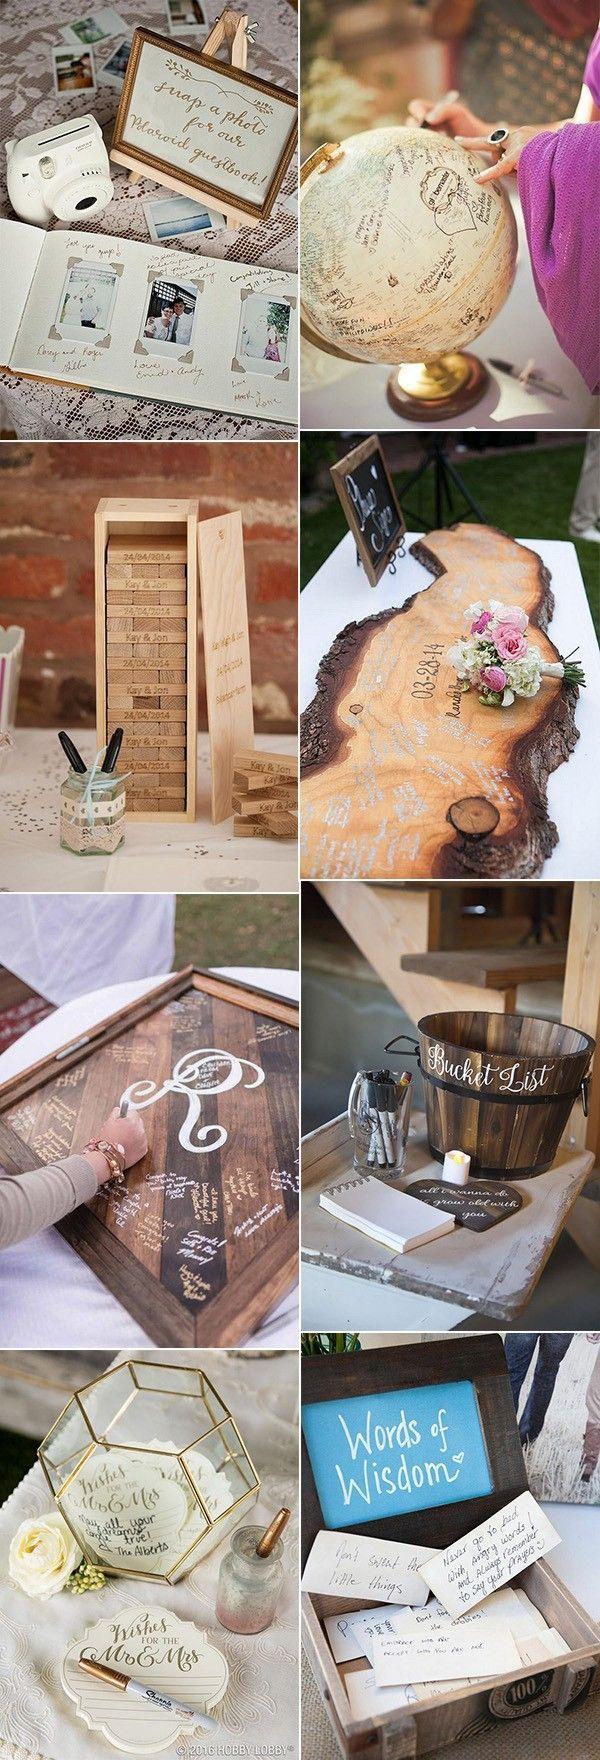 25 Creative Wedding Guest Book Ideas